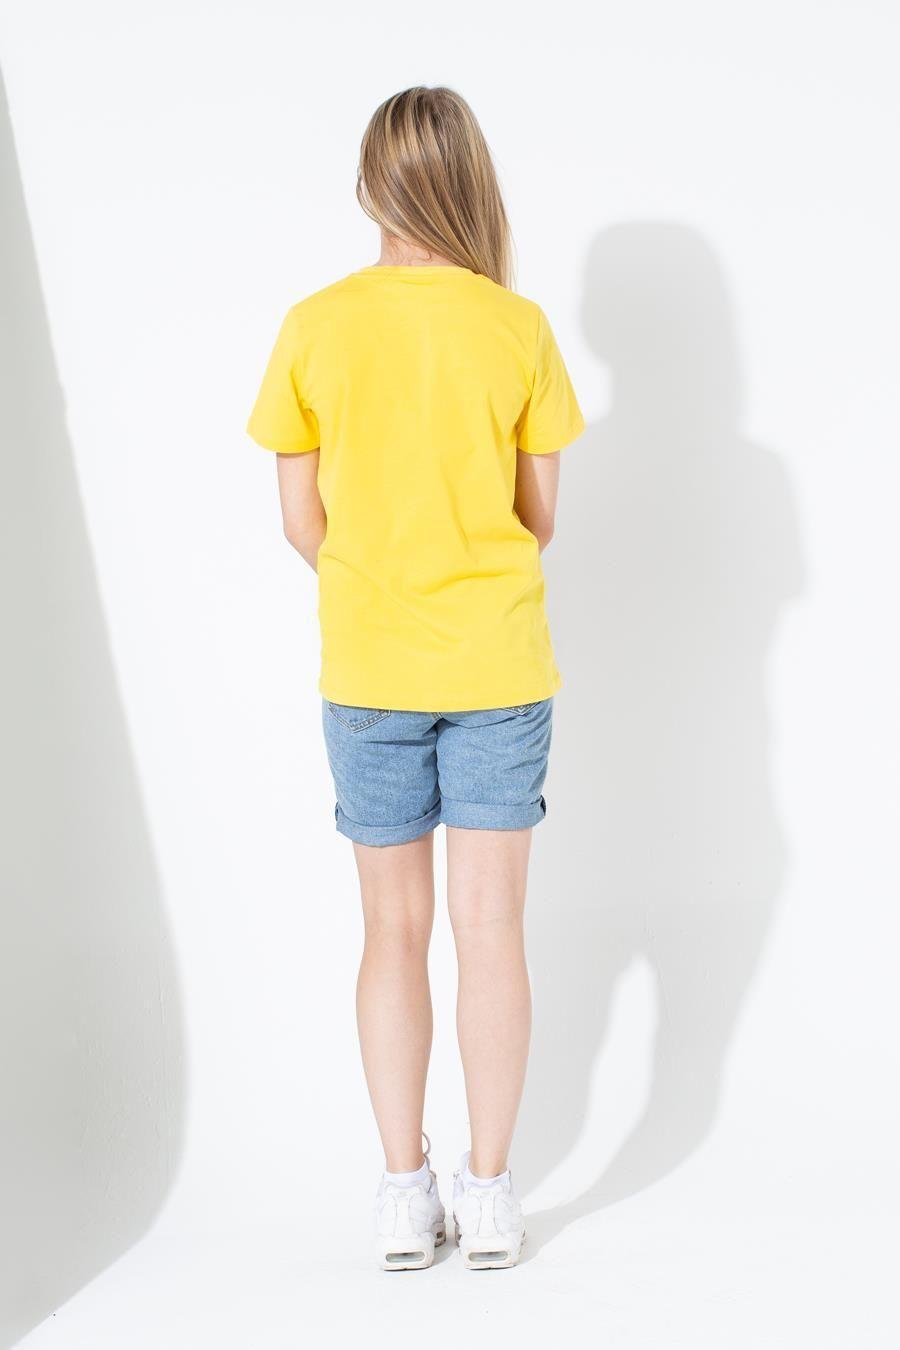 Hype Yellow Large Script Kids T-Shirt 7-8Y